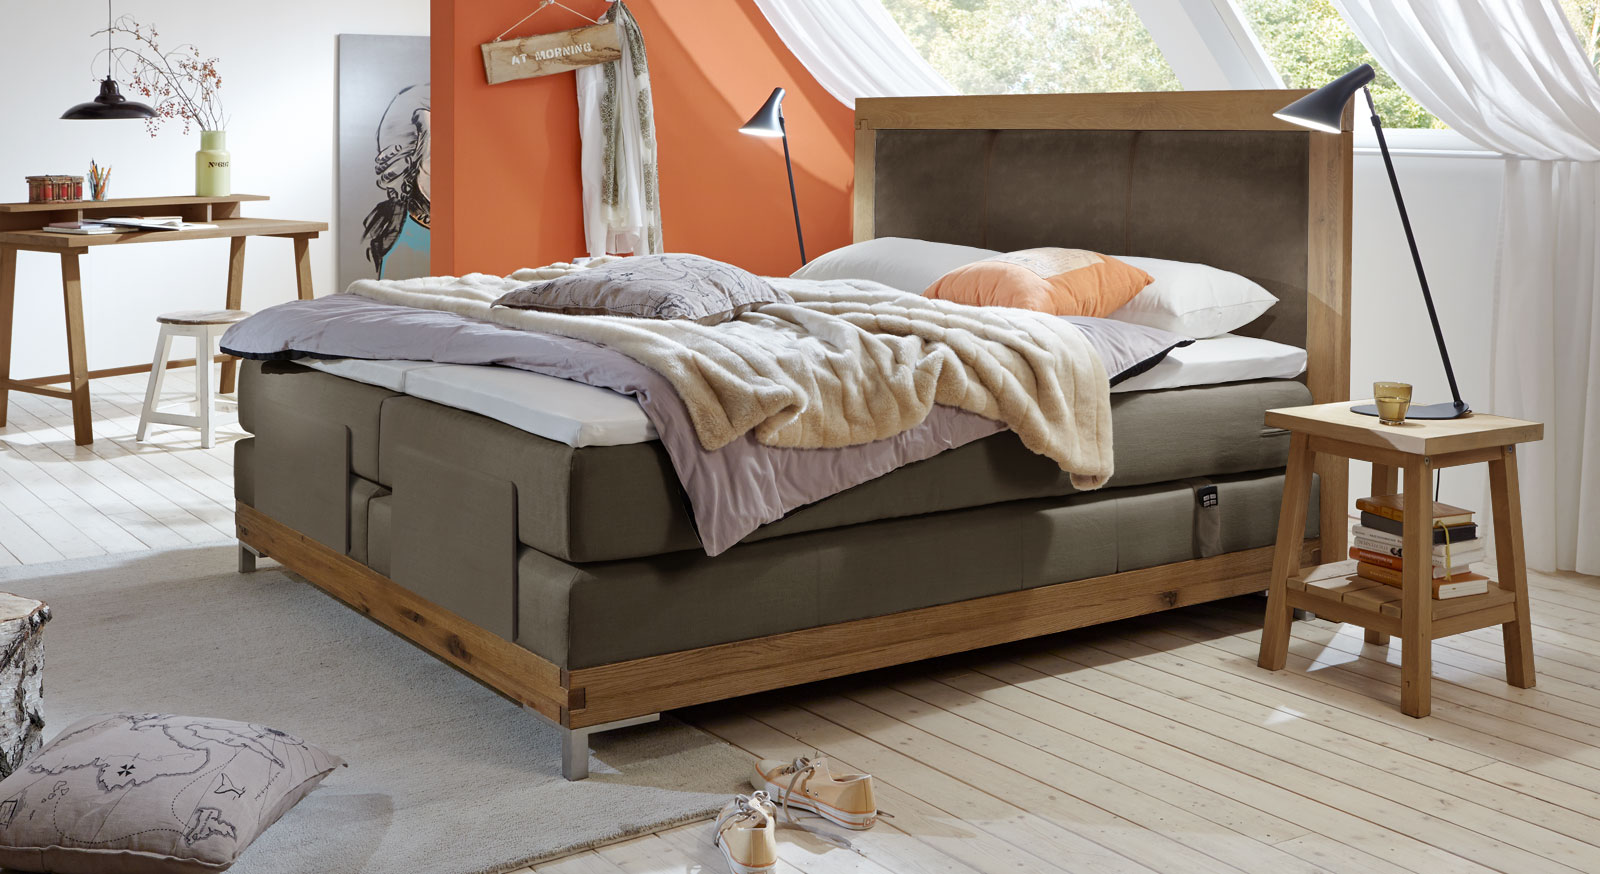 boxspringbett motorisch verstellbar arezzino elektro. Black Bedroom Furniture Sets. Home Design Ideas